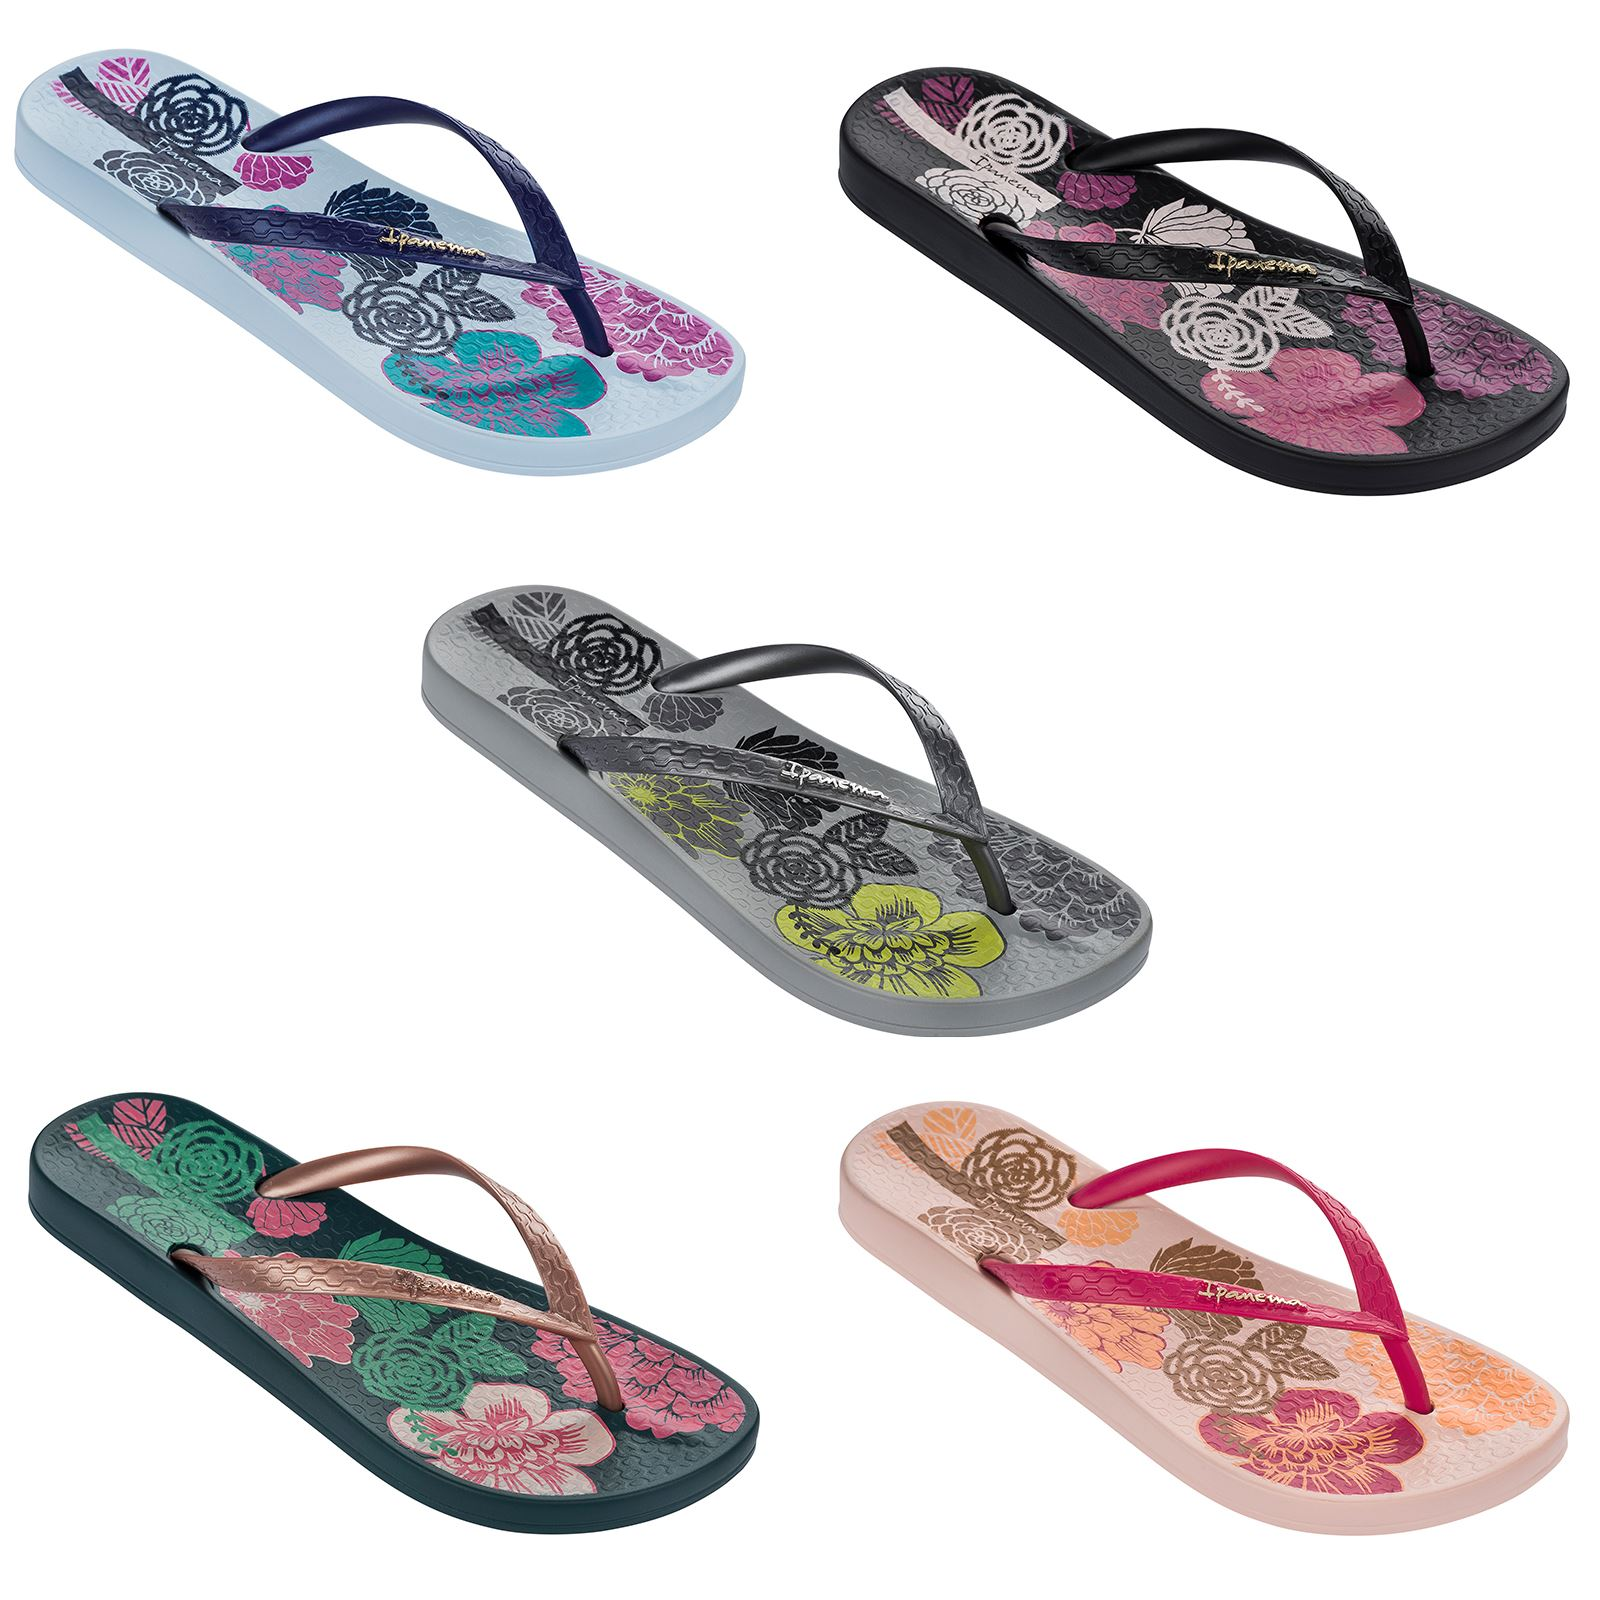 10578474f1ac Ipanema Petal V Flowers Print Slim Footbed Flip Flops Beach Sandals 81924